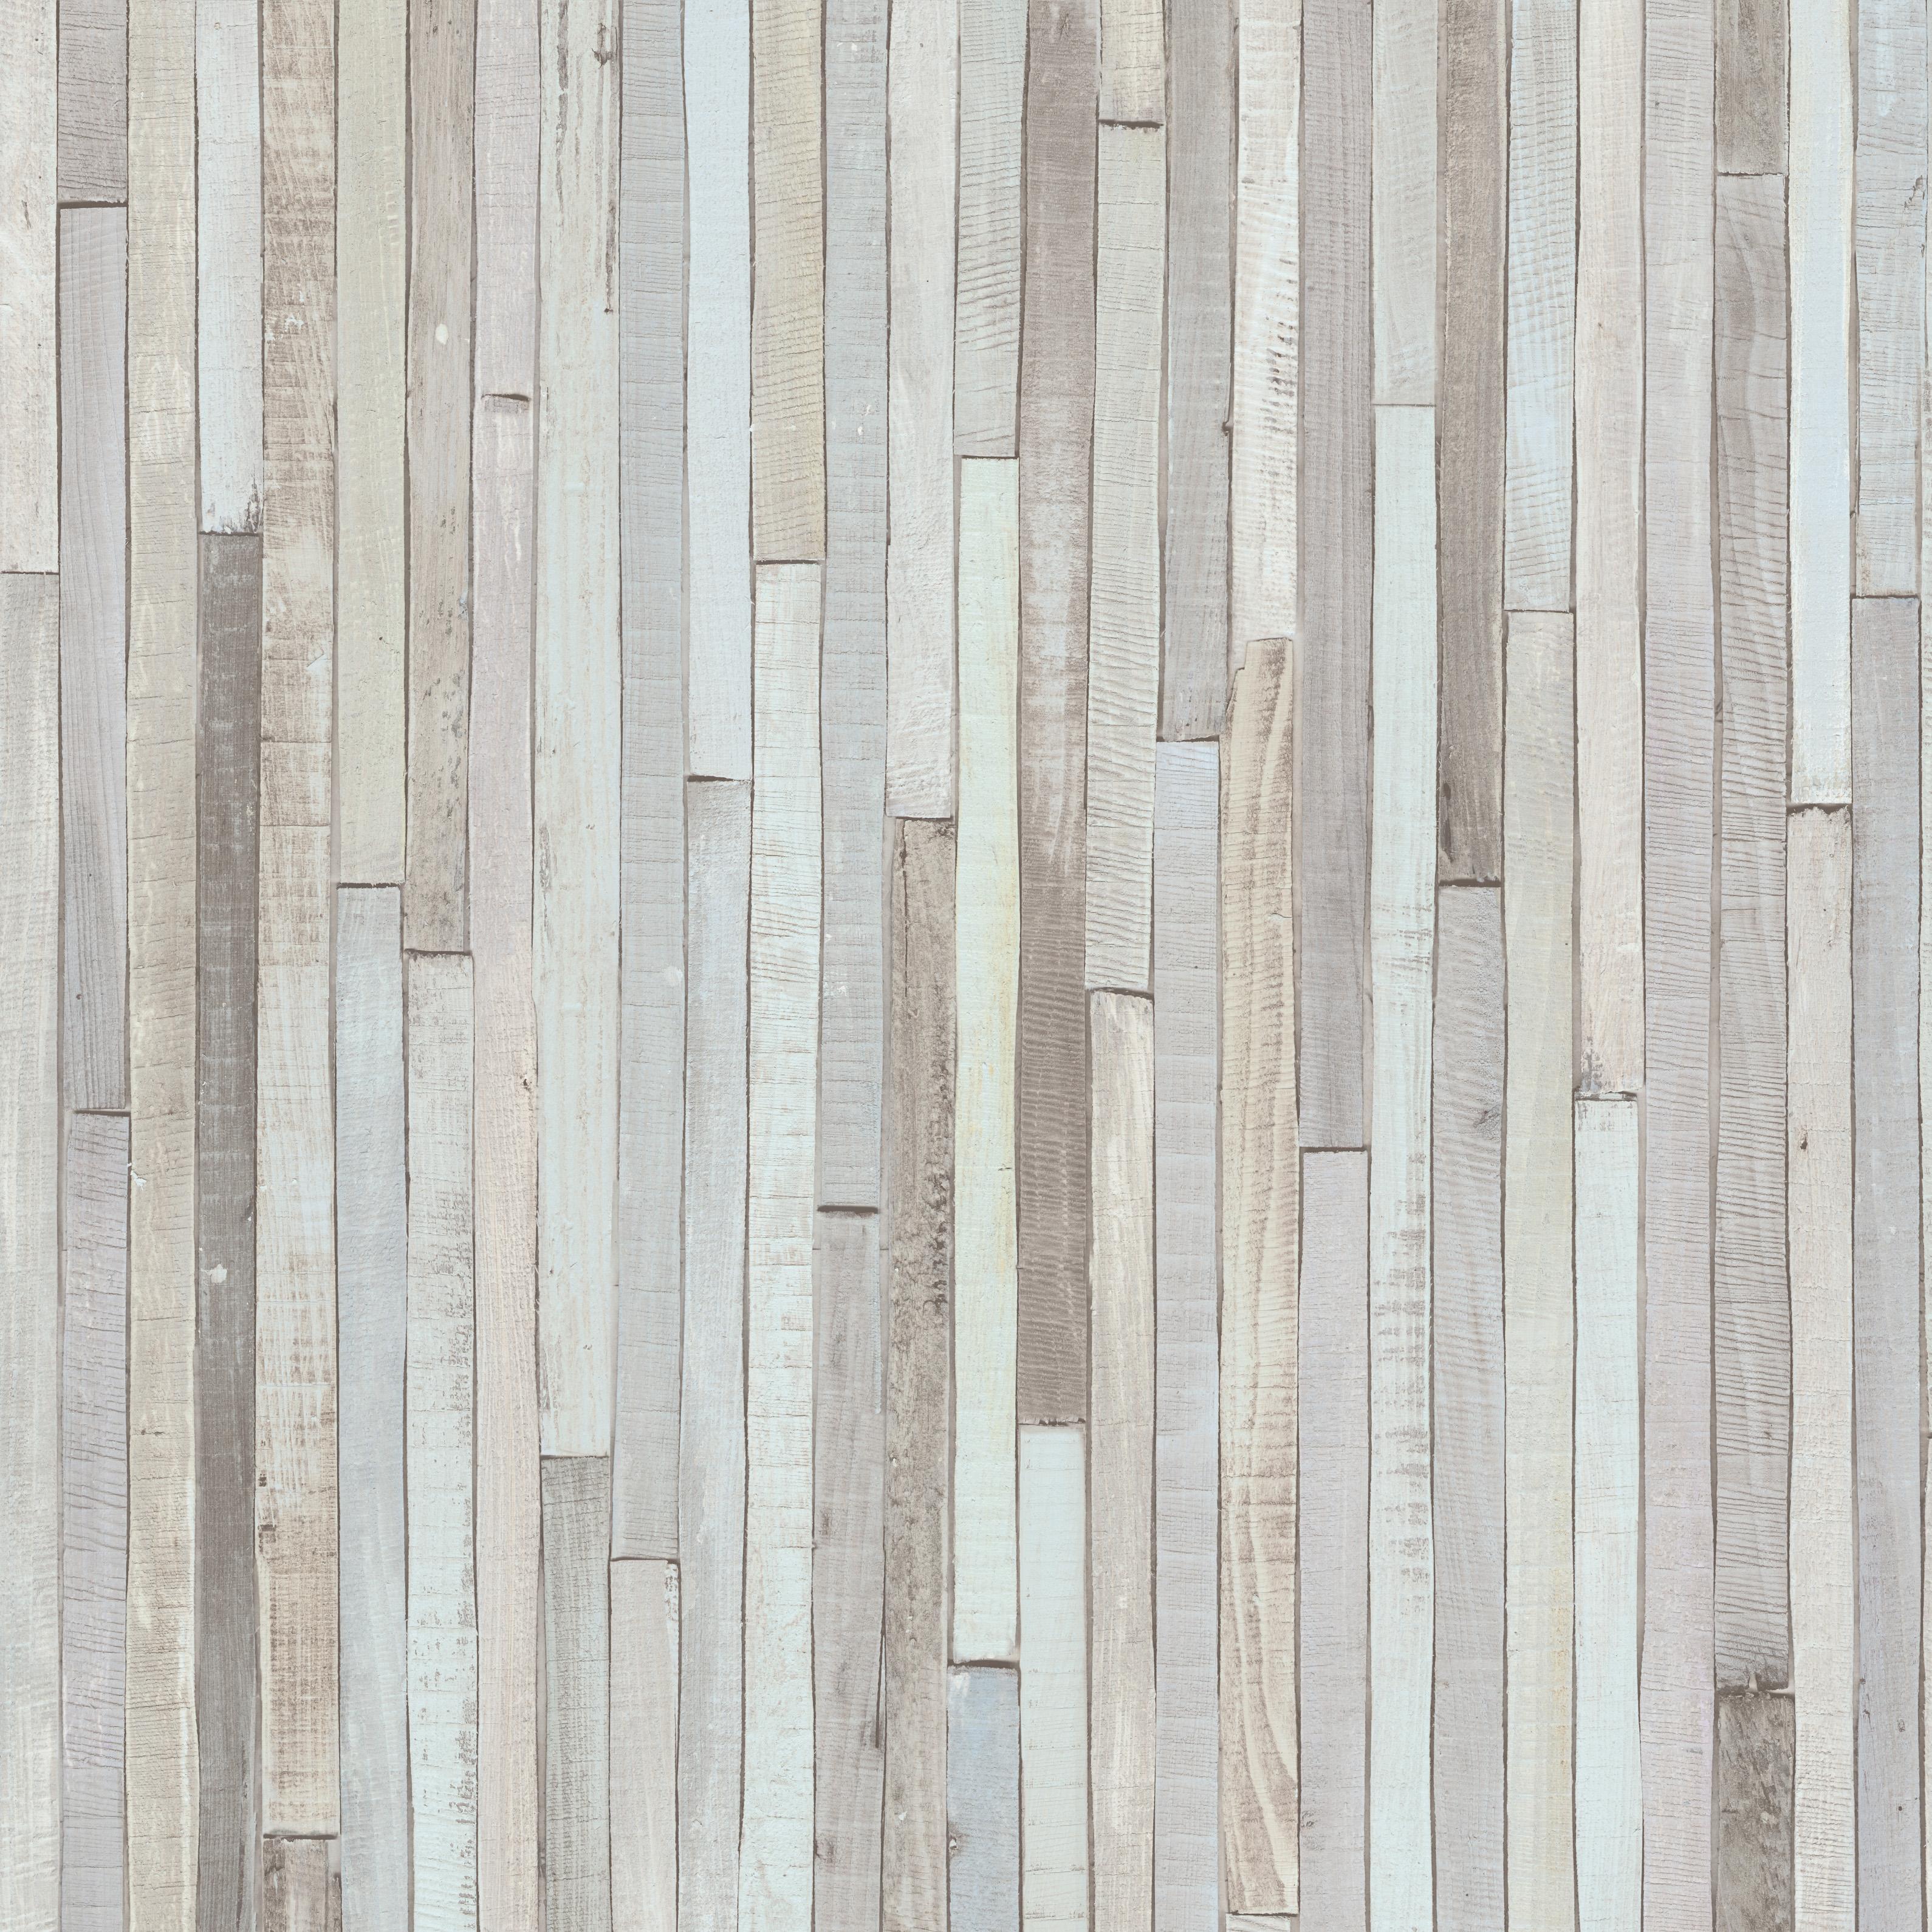 Pastel Purple Pink Green Blue Timber Wood Look: Distressed Wood Wallpaper